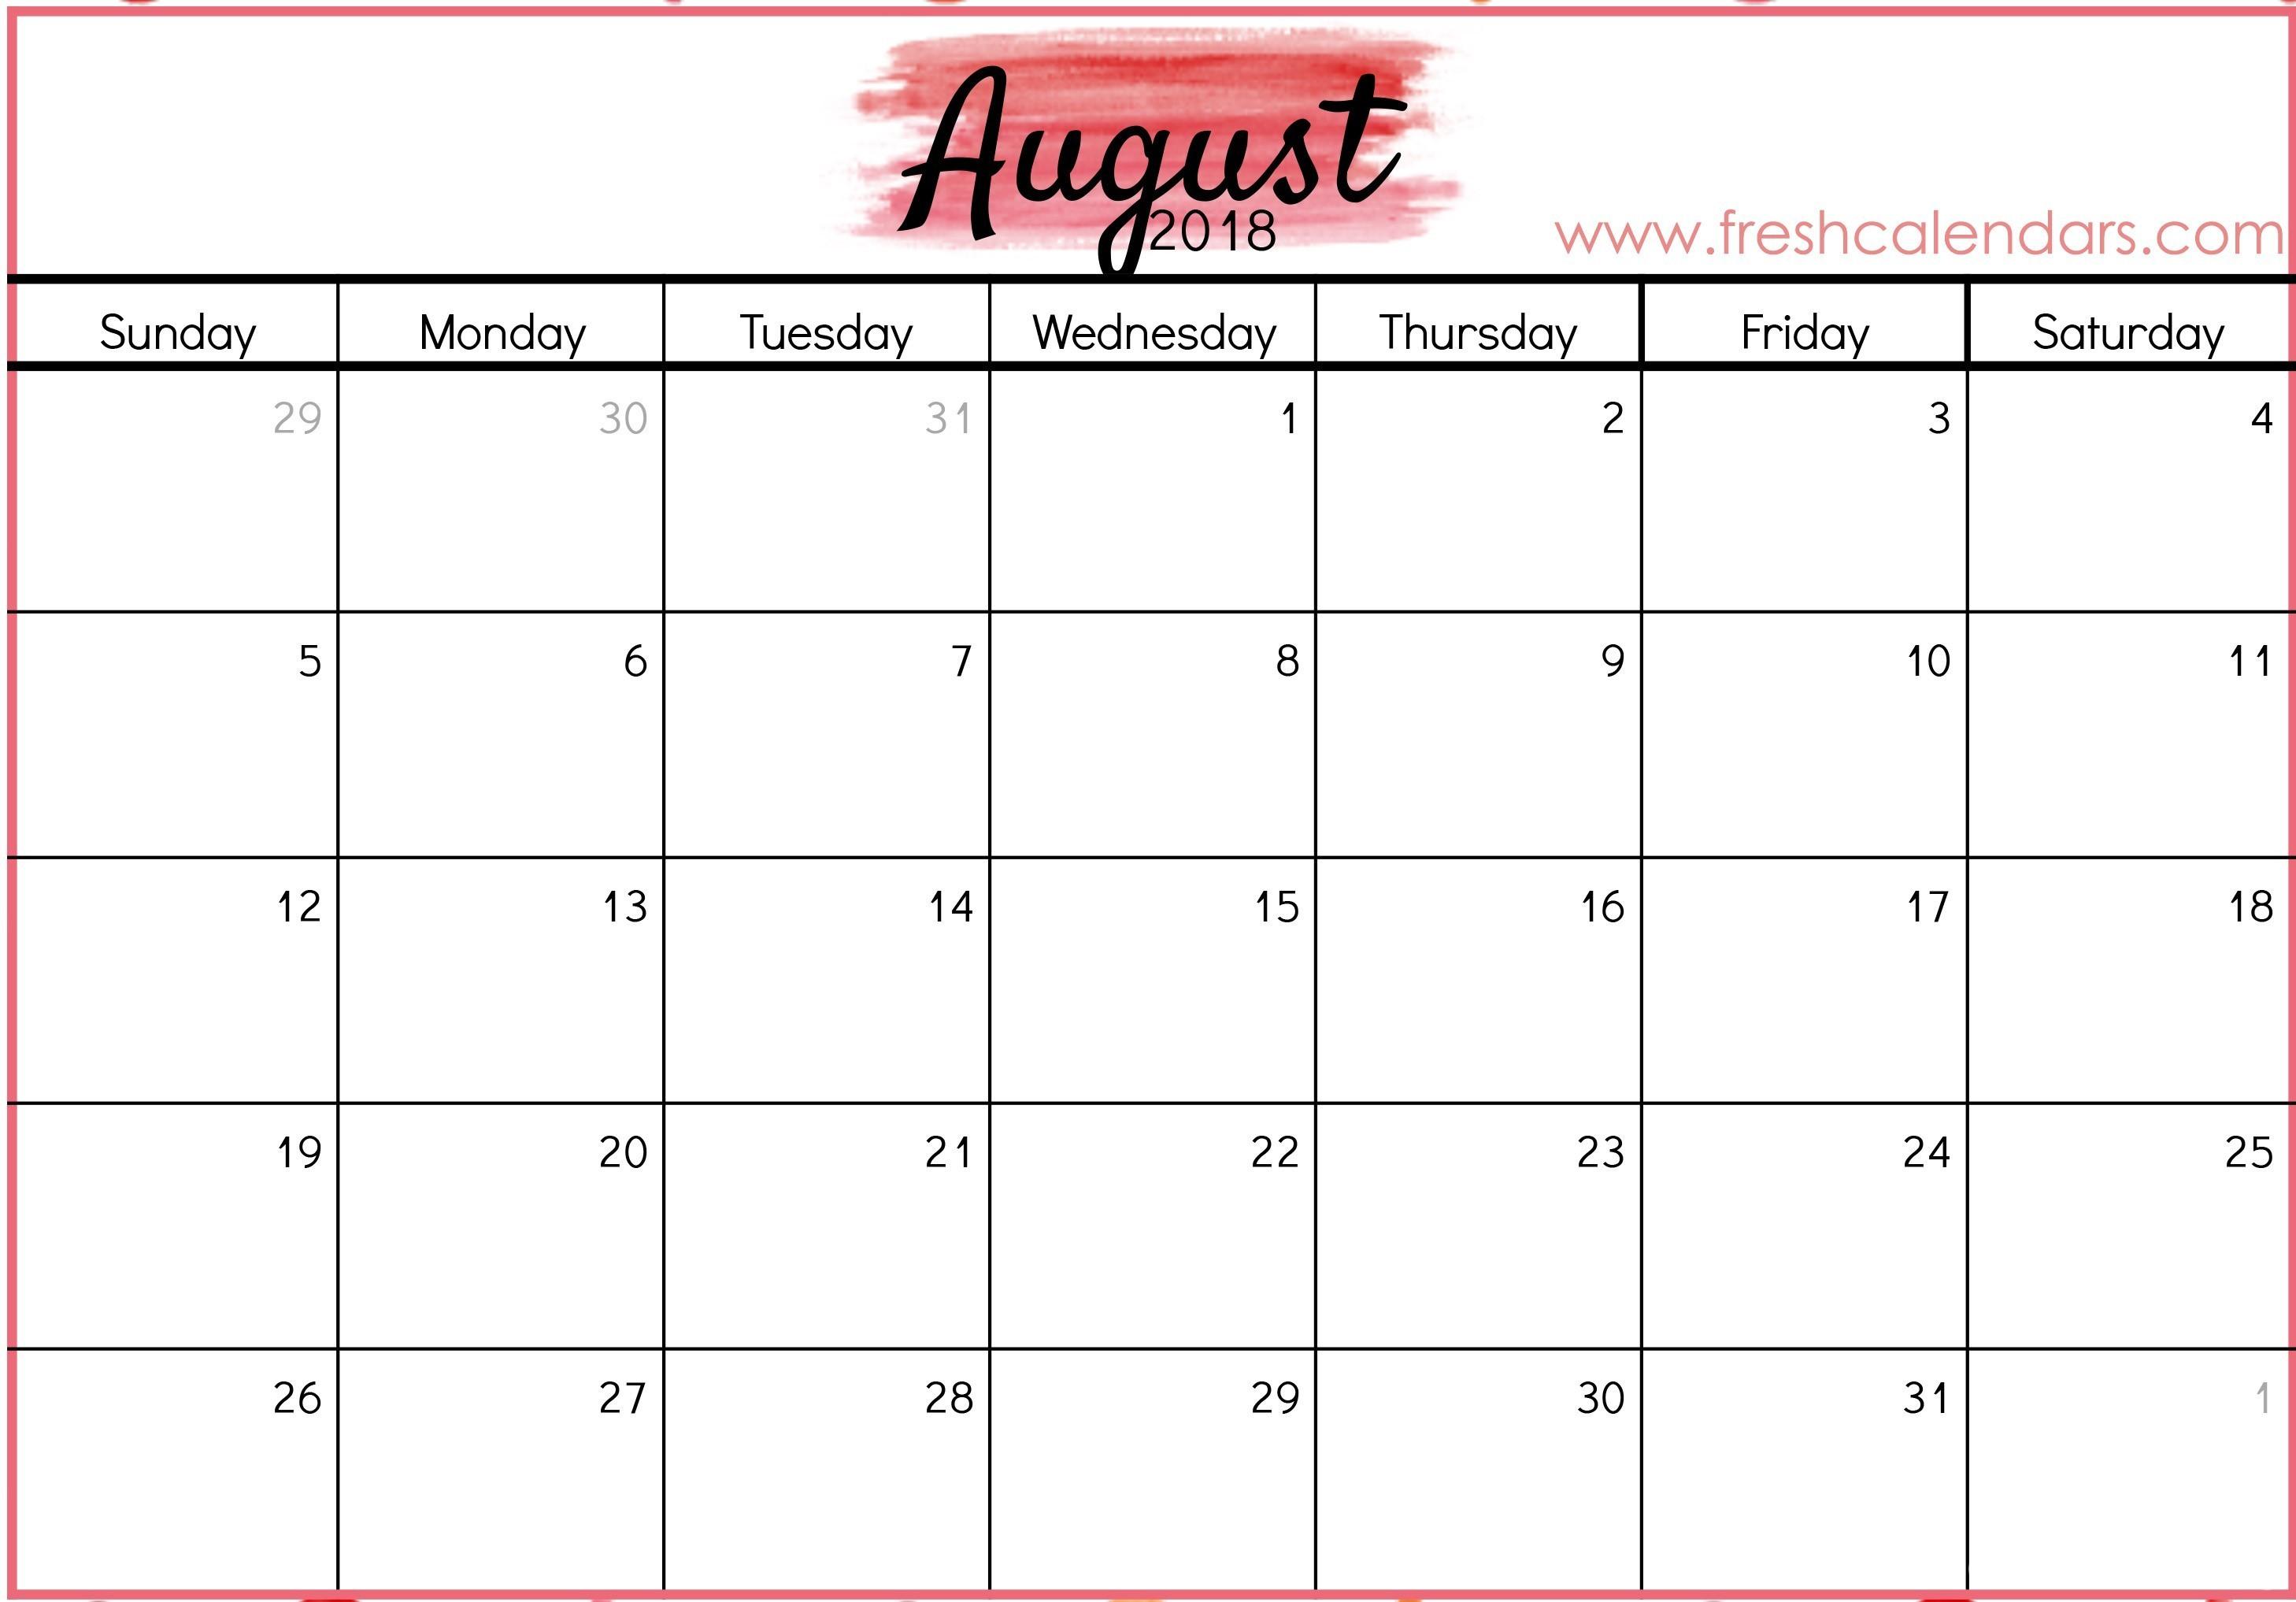 Labeled August Calendar Printable 2016 2017 Free 86 January 2018 Calendar Printable Imom Imom Calendar 2018 April por calendario 2019 para imprimir